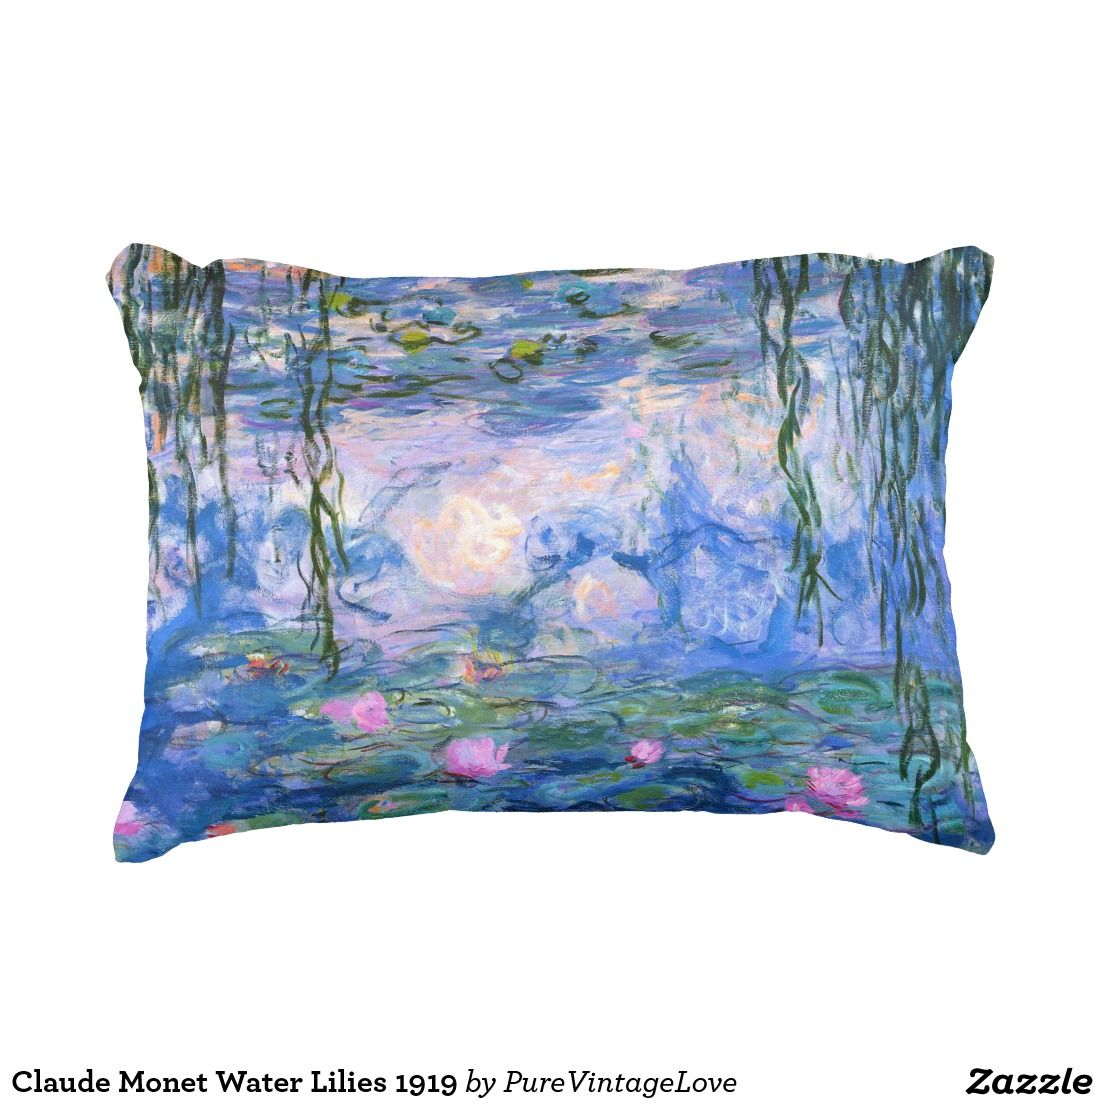 Claude Monet Water Lilies 1919